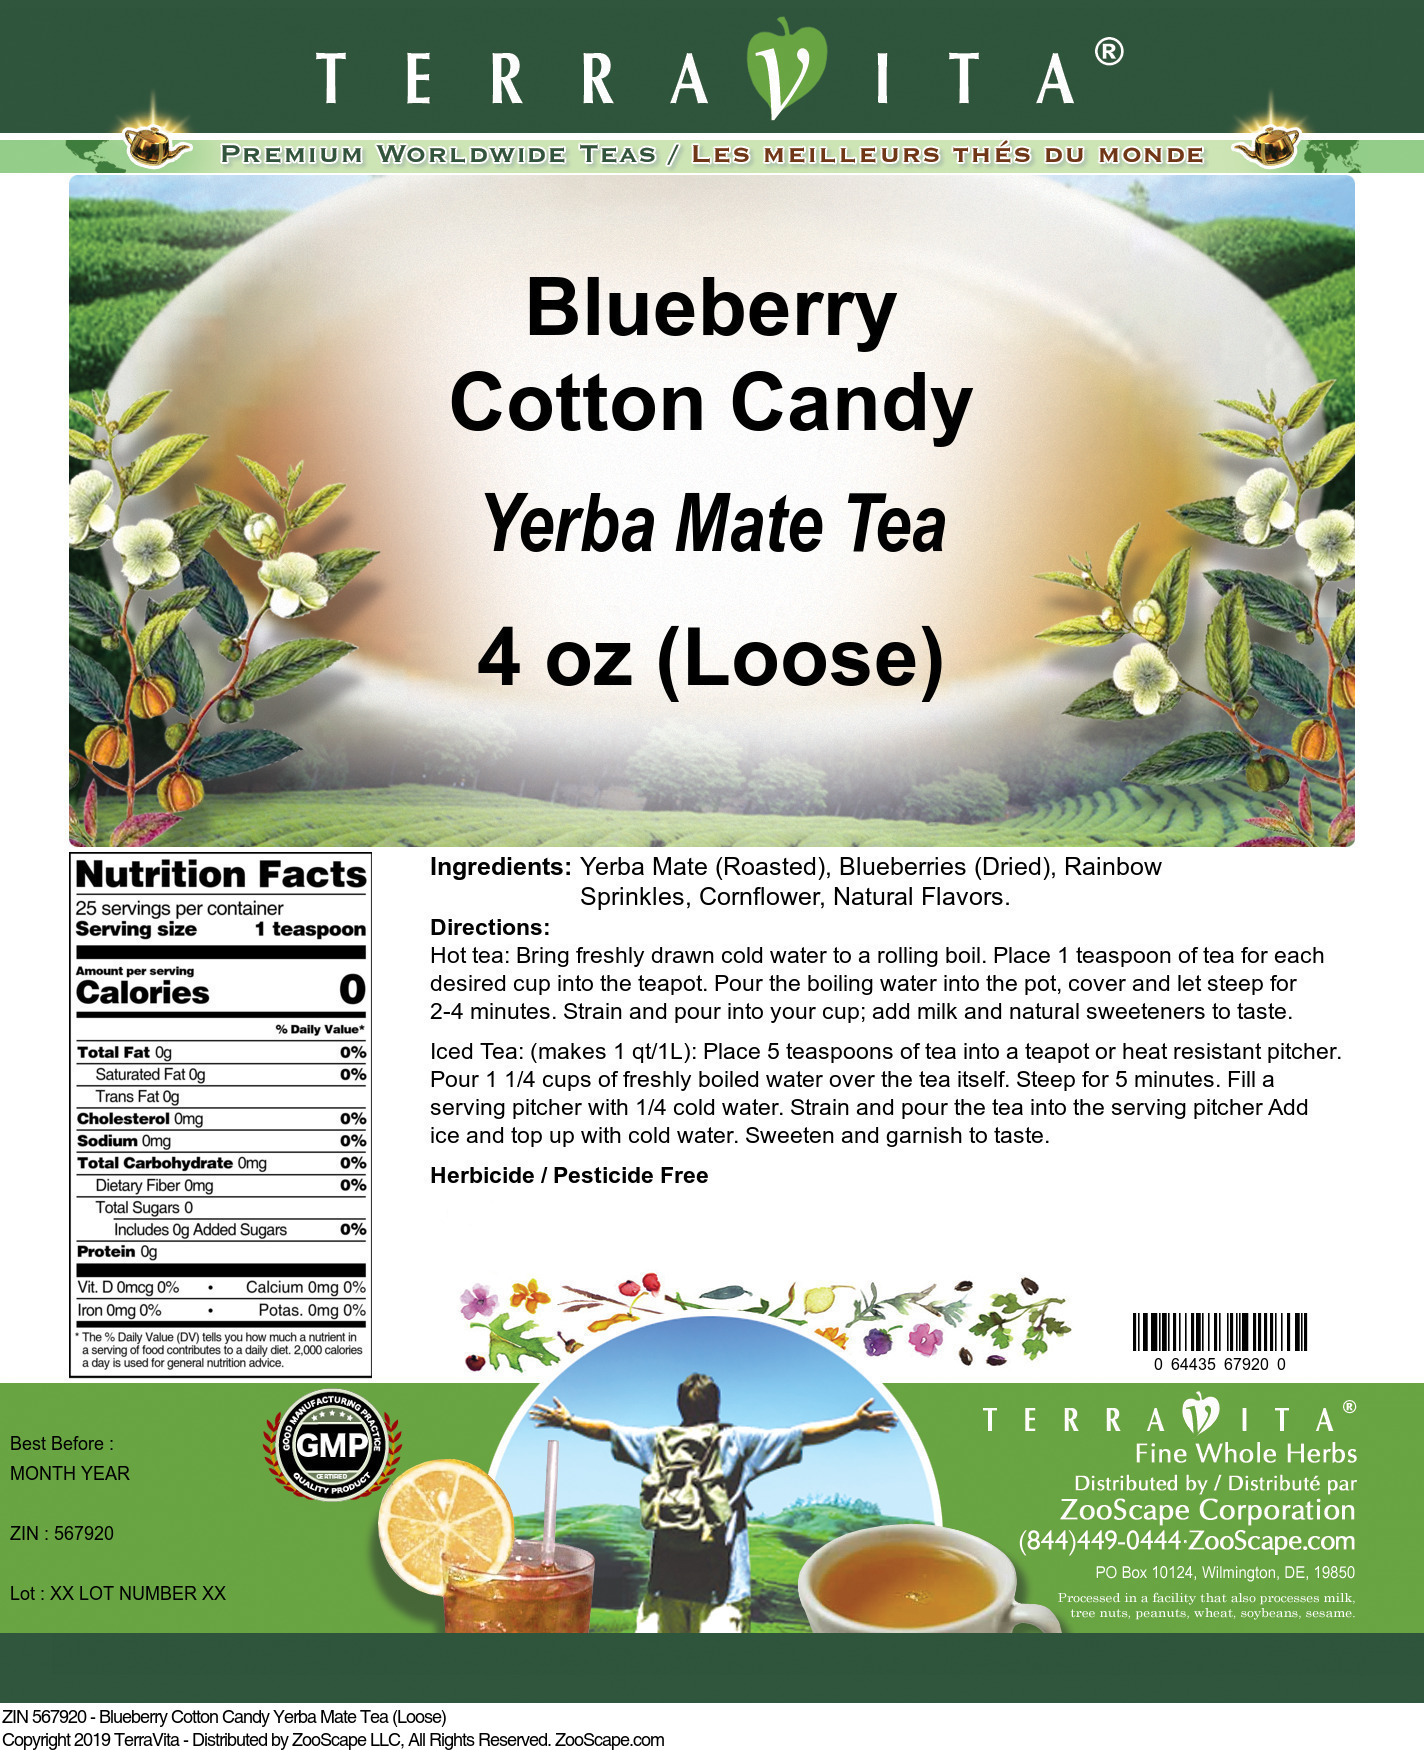 Blueberry Cotton Candy Yerba Mate